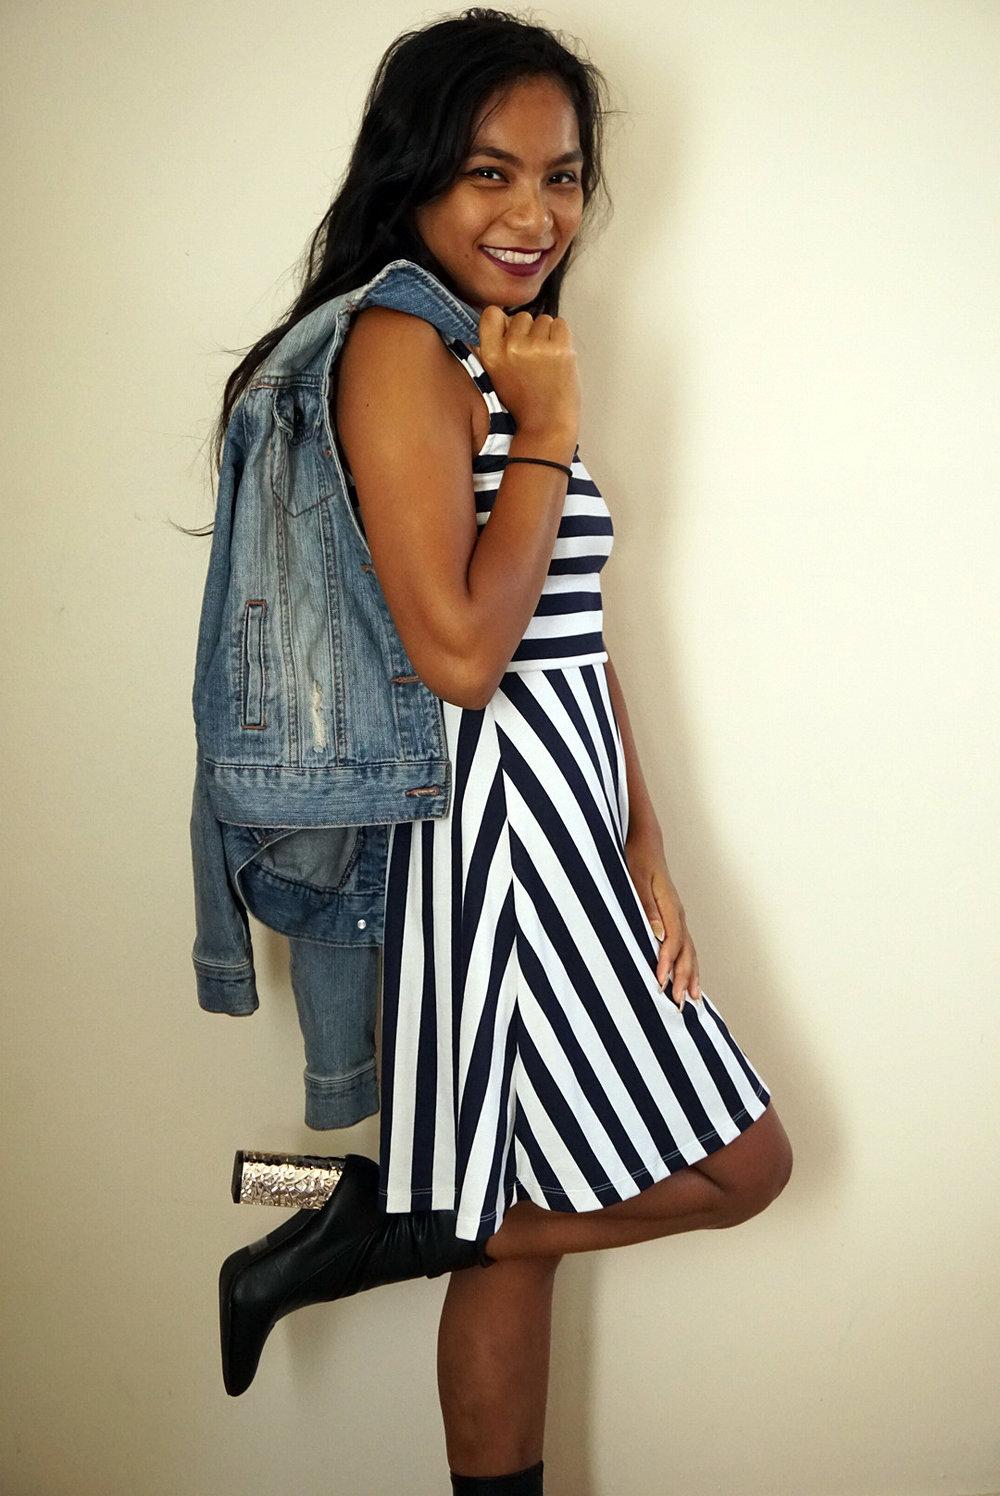 Striped-Dress-Black-Amiclubwear-Boots-Fall-Style-Blogger-LINDATENCHITRAN-3-1616x1080.jpg